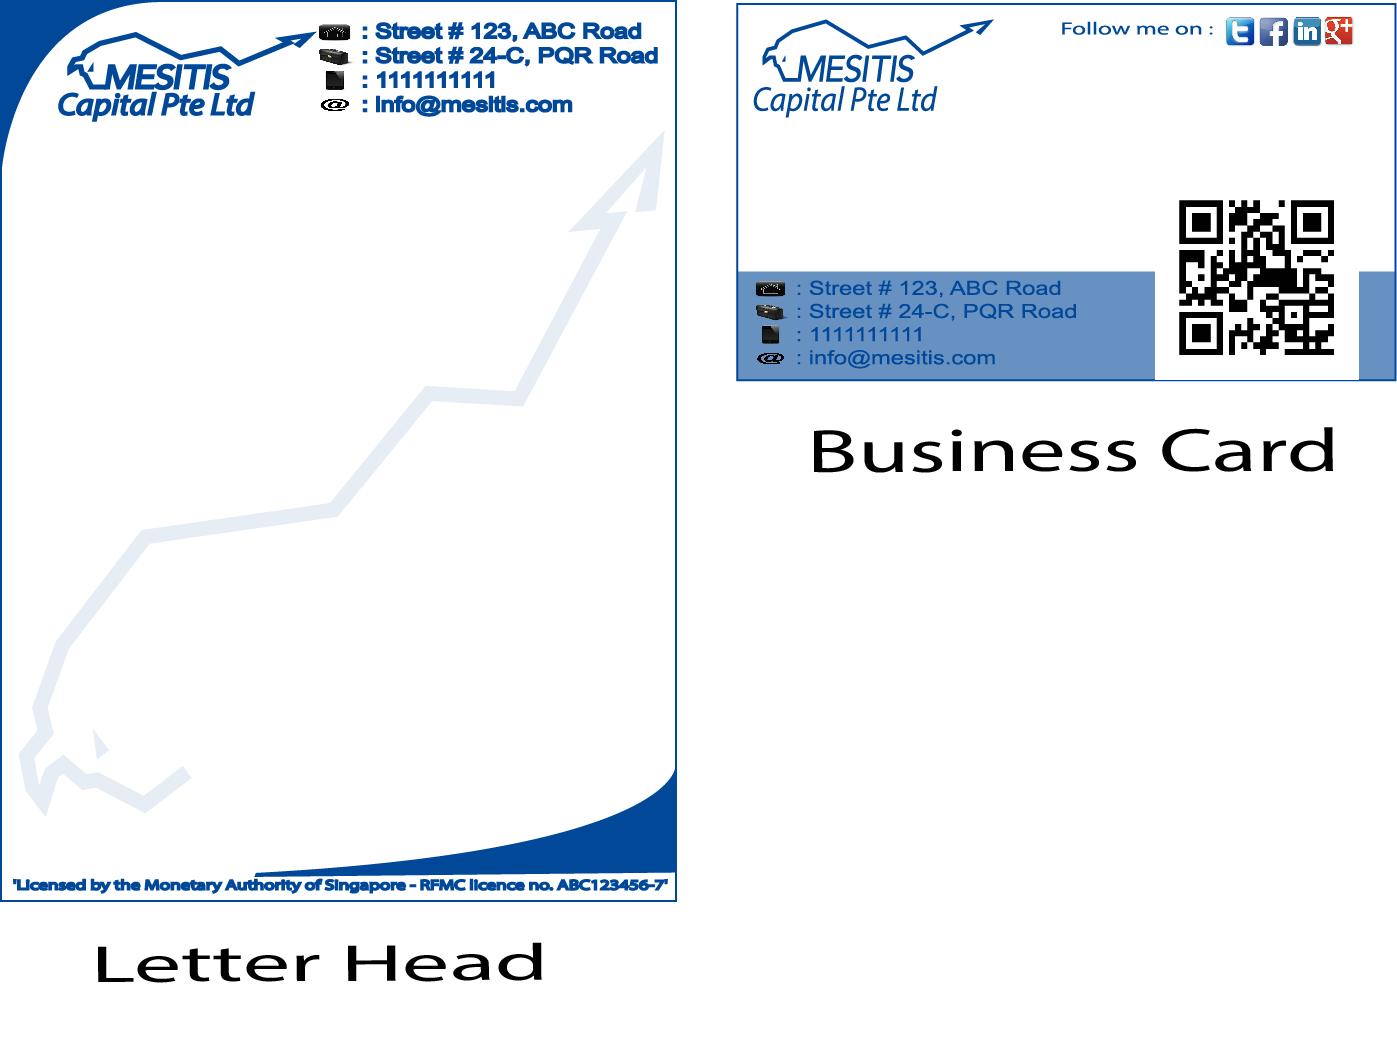 Letterhead design for mesitis capital pte ltd by for Design company singapore